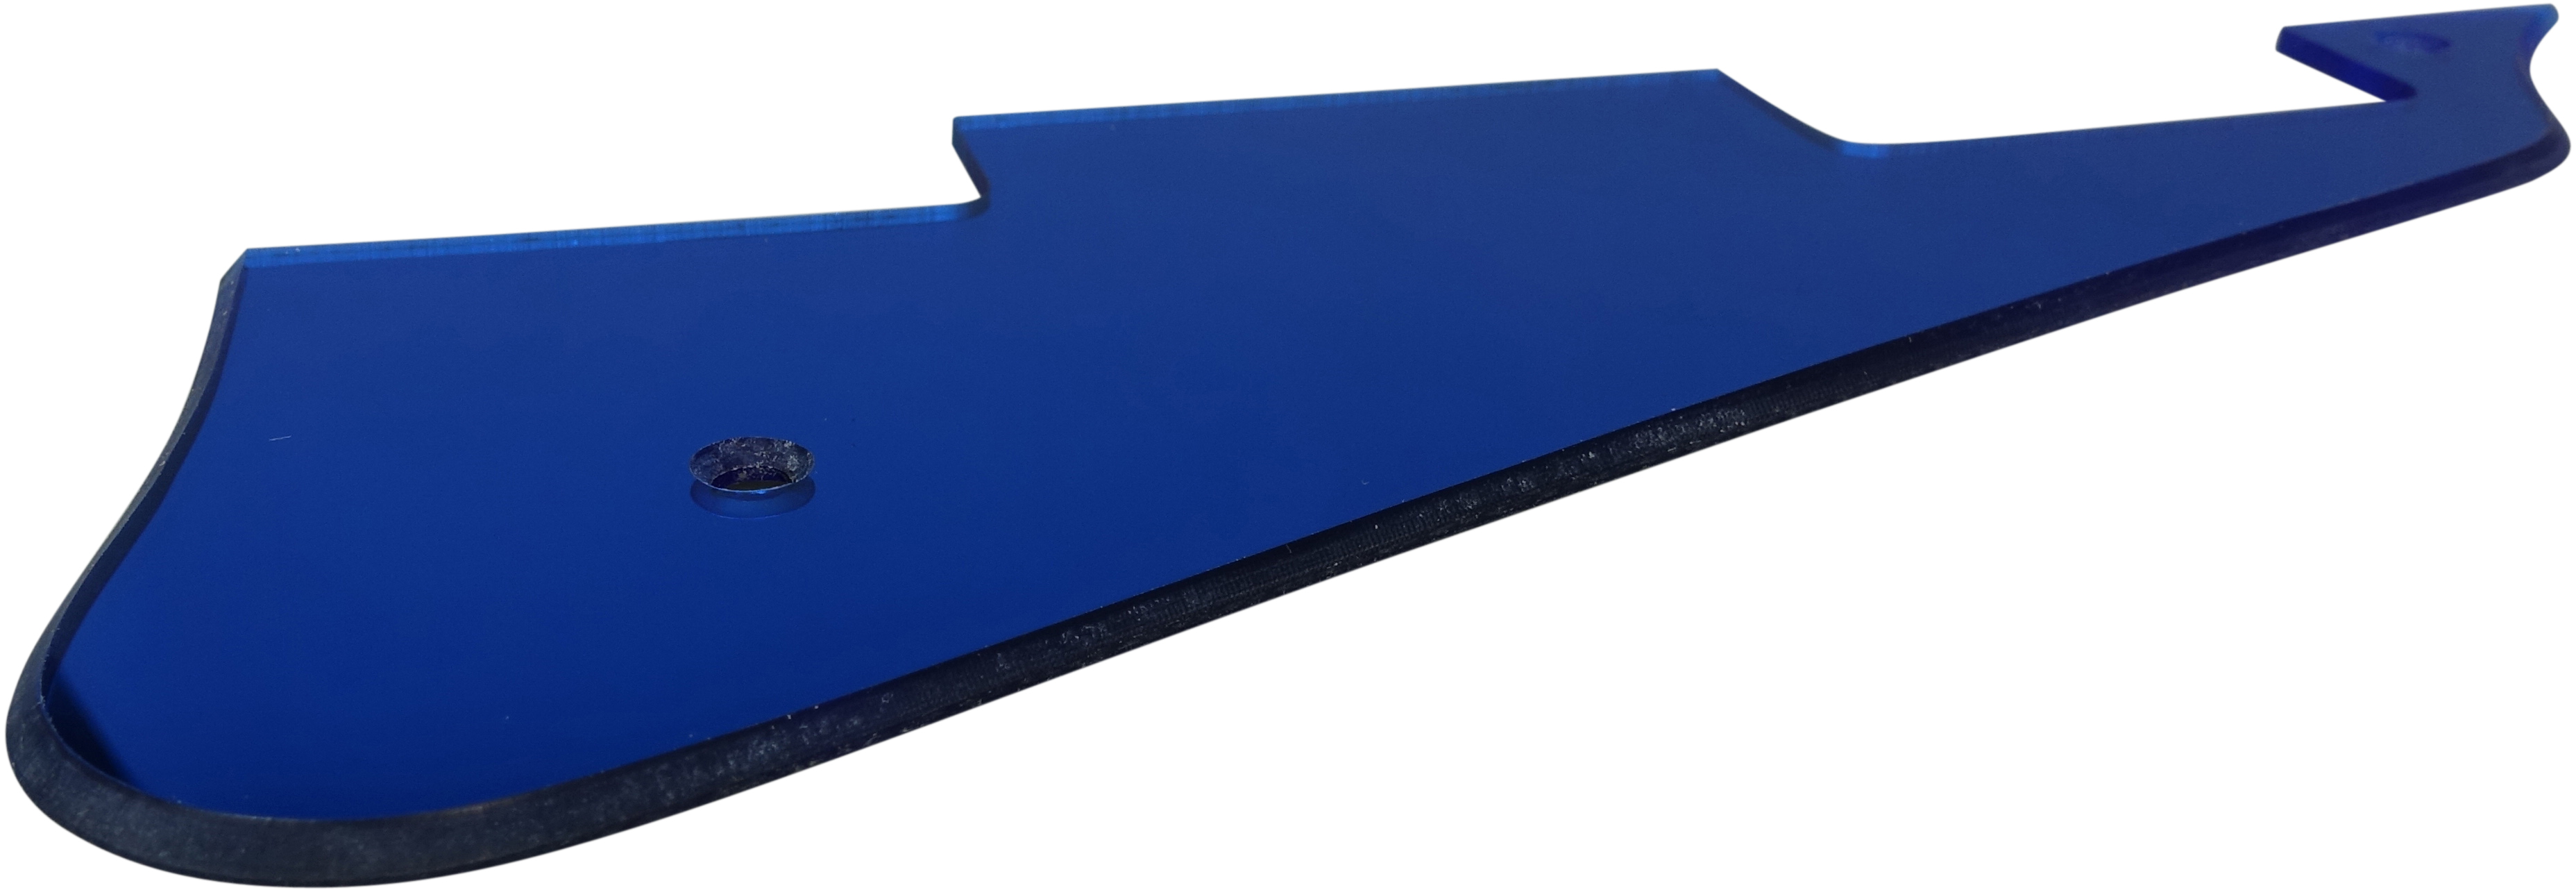 Toronzo Pickguard LP-2PLY-Mirror Blue